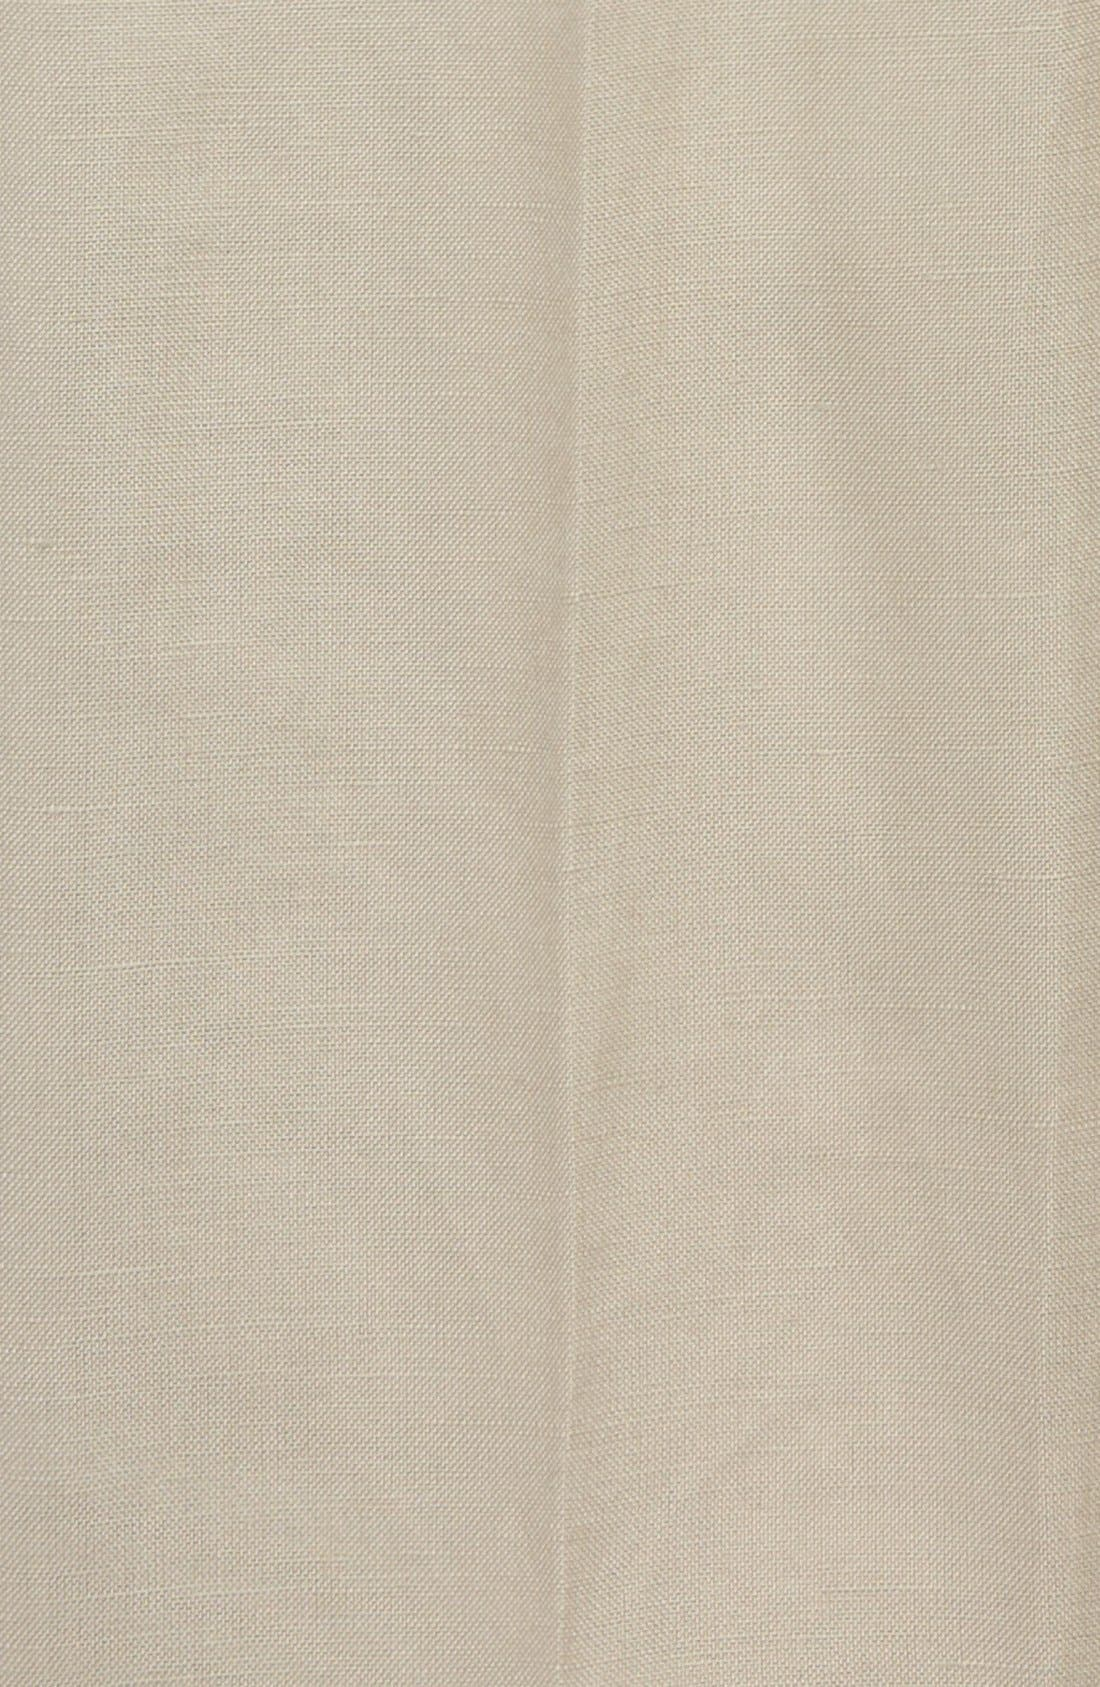 Alternate Image 2  - Nordstrom 'Quentin' Linen Blend Trousers (Toddler Boys, Little Boys & Big Boys)